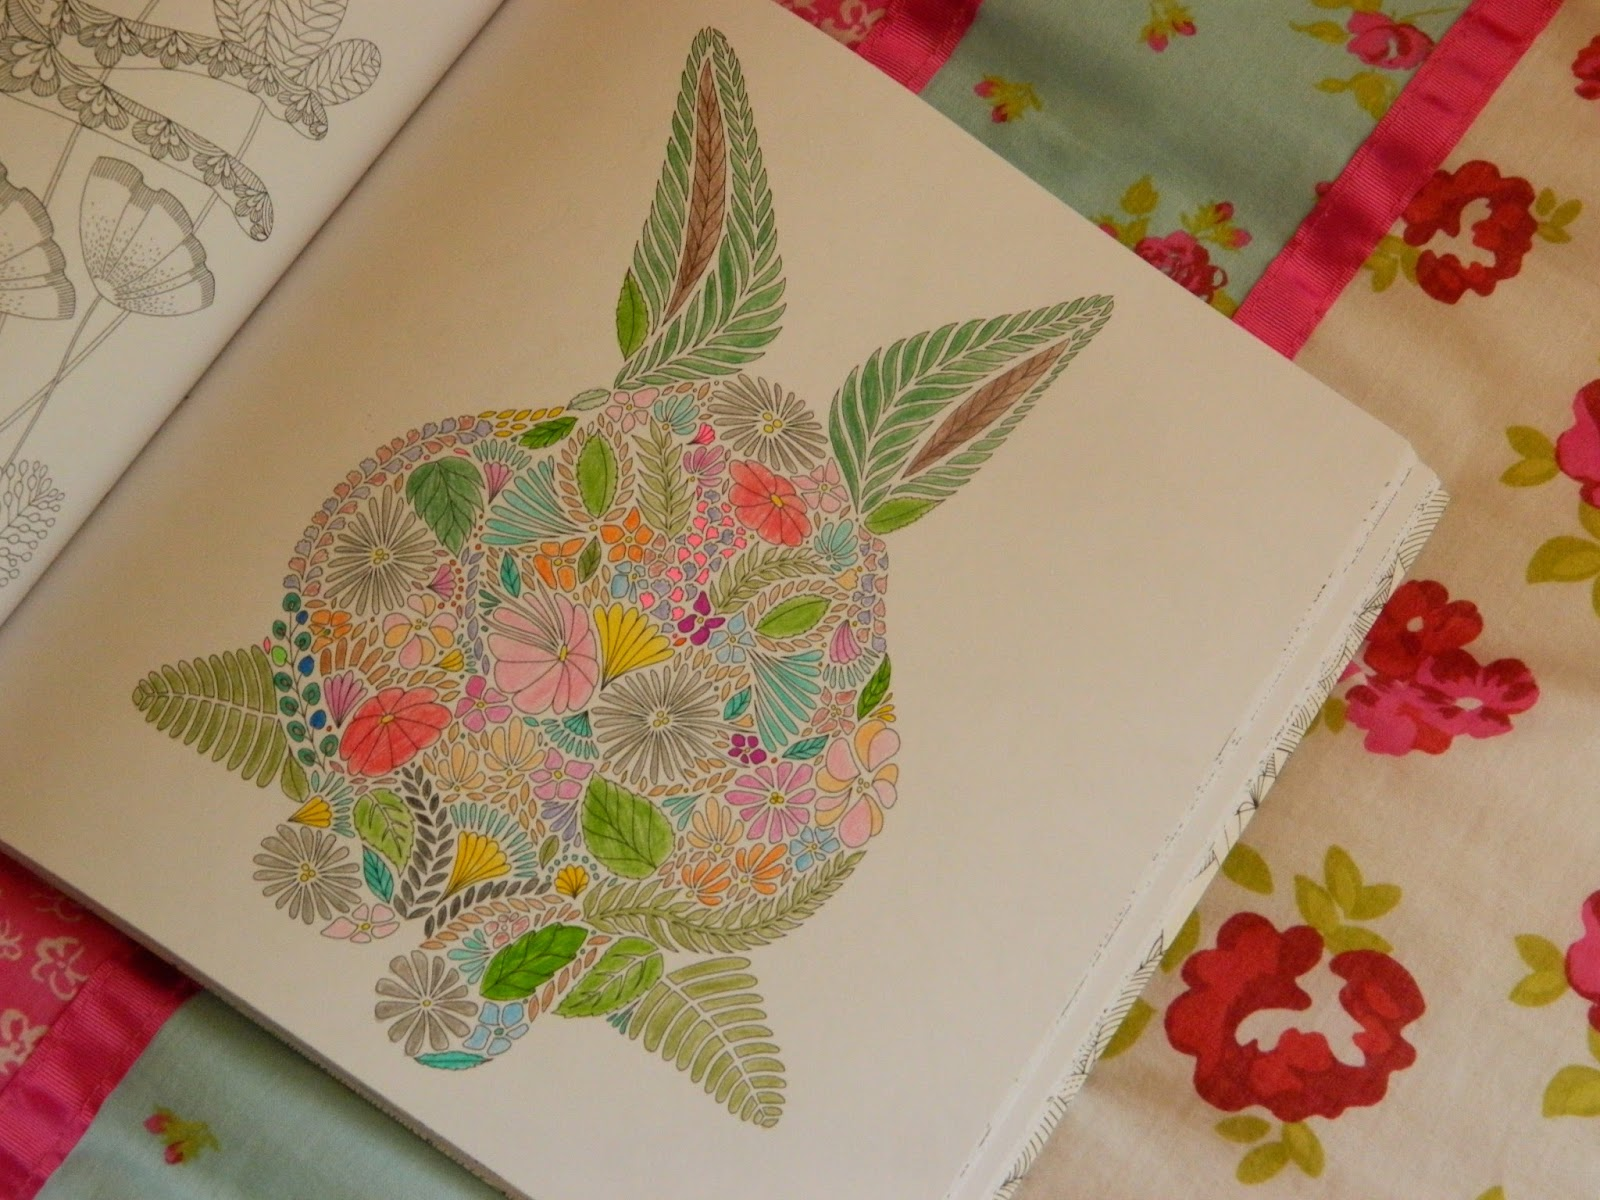 Animal Kingdom By Millie Marotta Colouring Books Adult